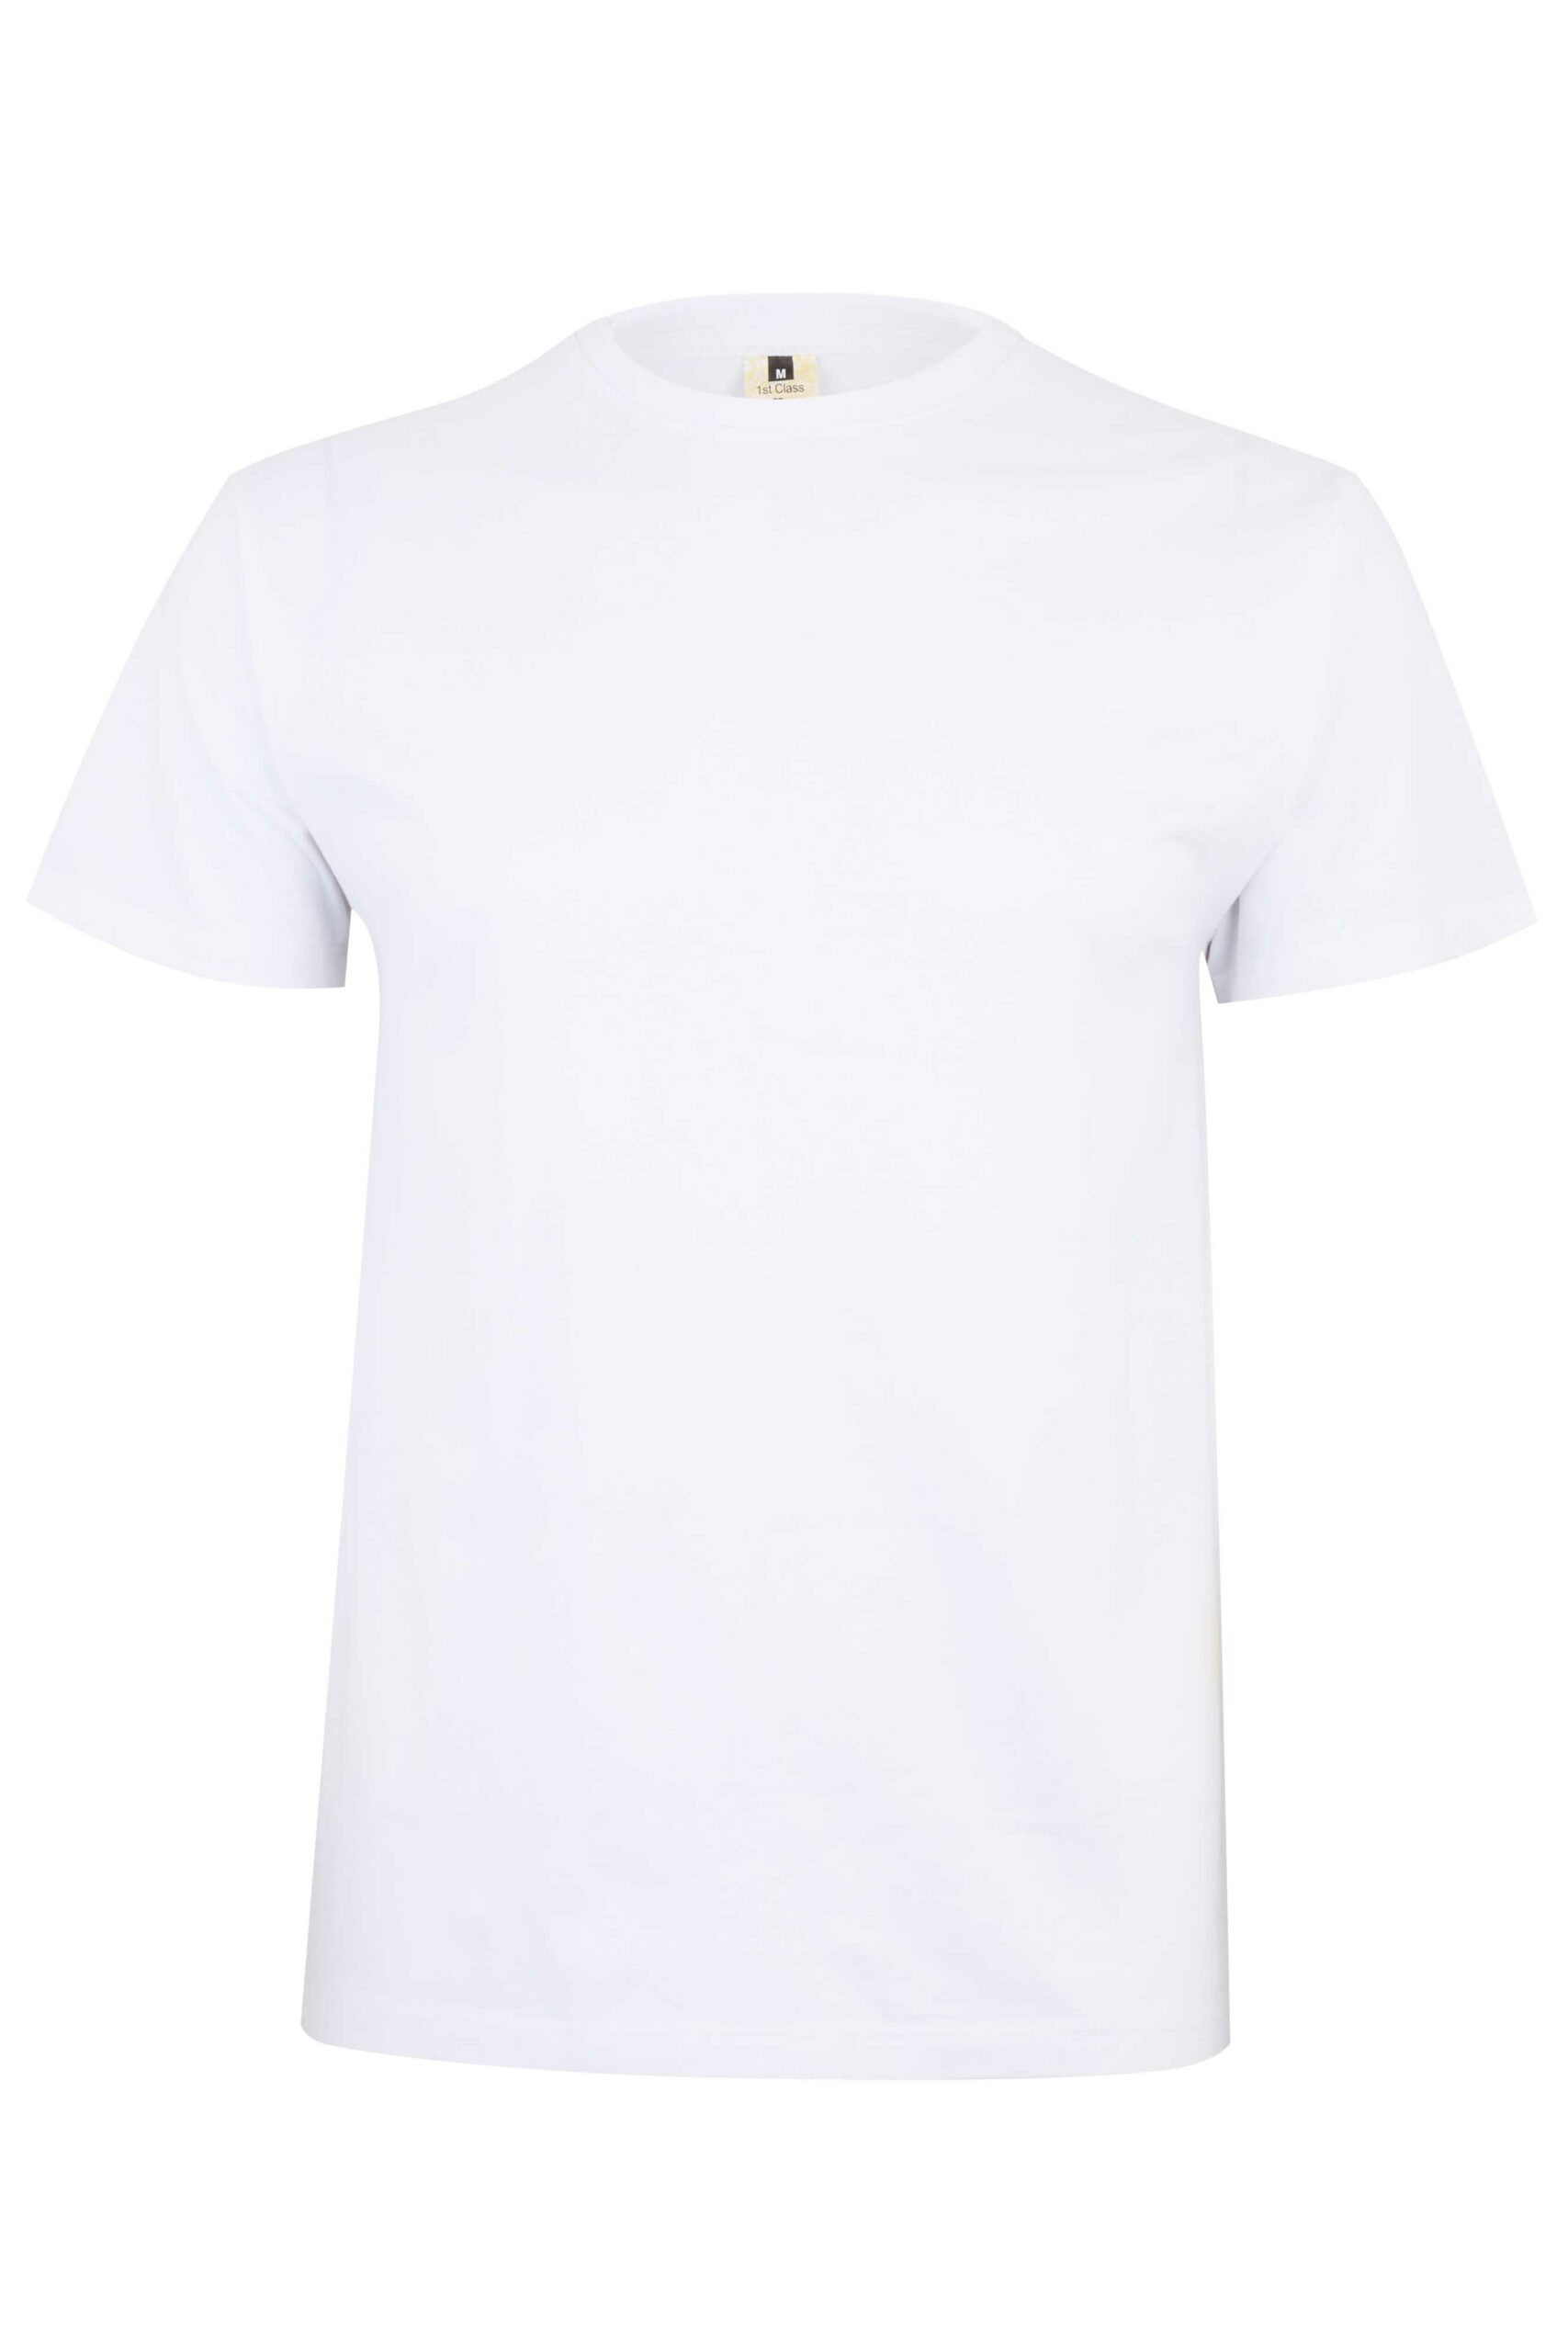 Mukua Mk023wv Camiseta Manga Corta Color 190gr White